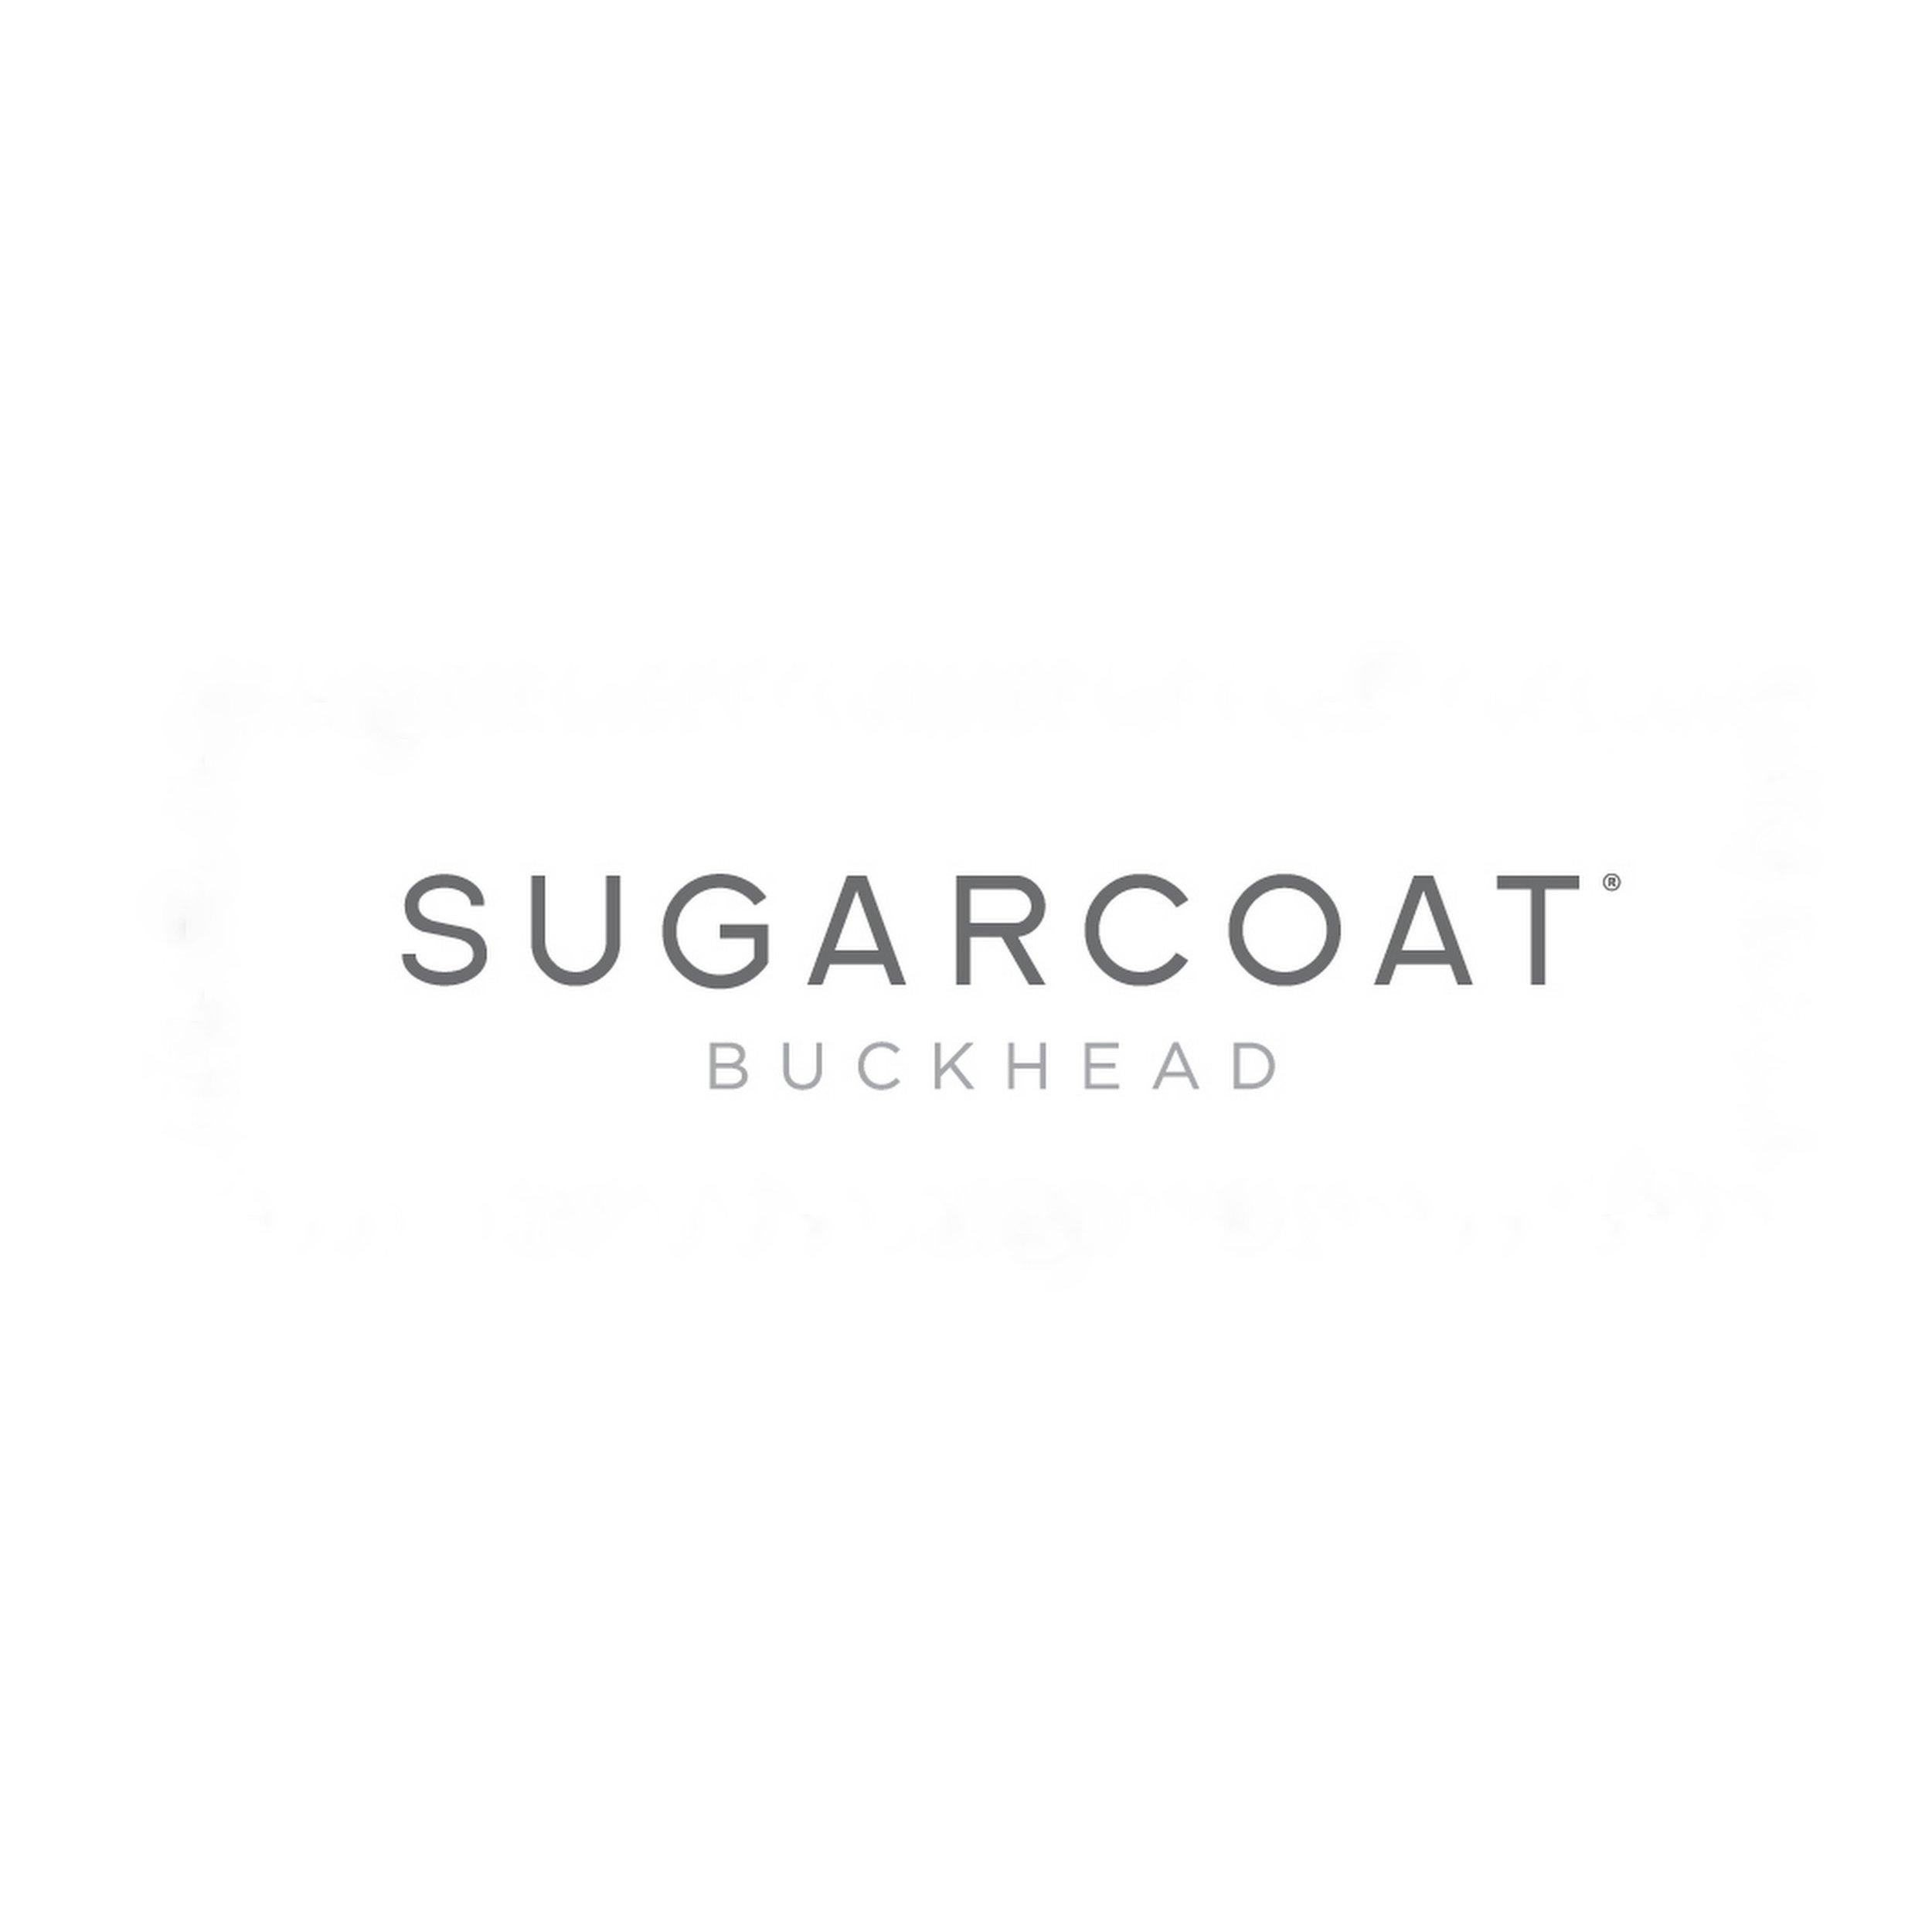 Sugarcoat Logo Buckhead.jpg